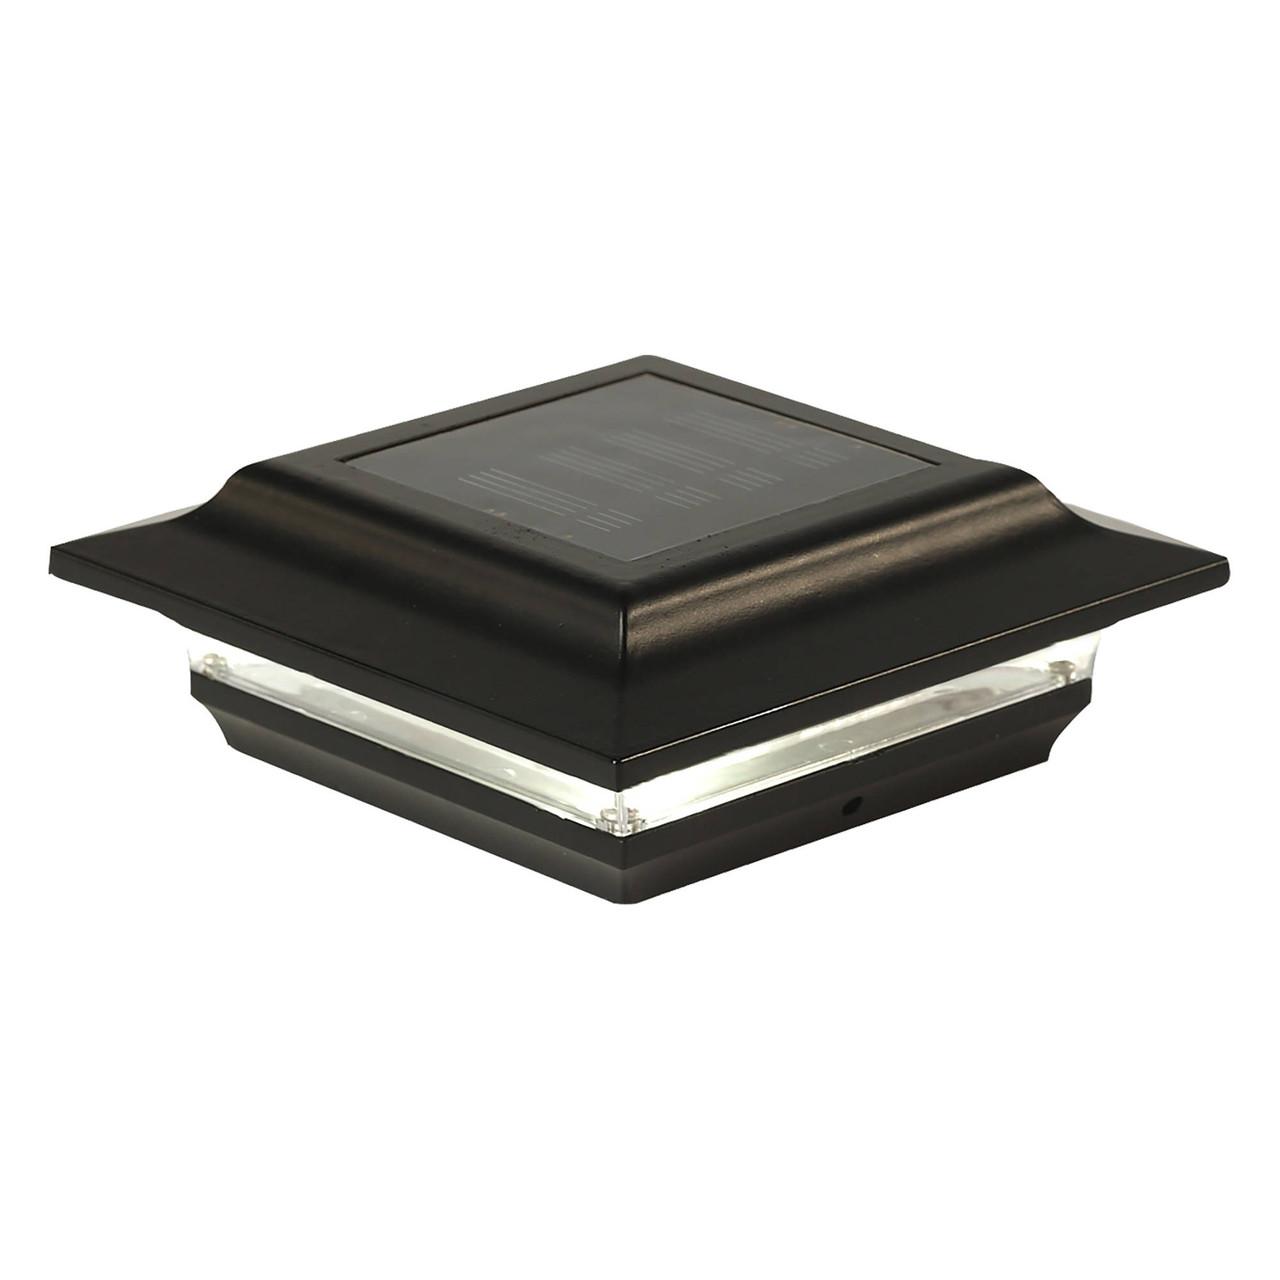 "5"" x 5"" Black Imperial Aluminum Solar Post Cap from Classy Caps - SL214B"